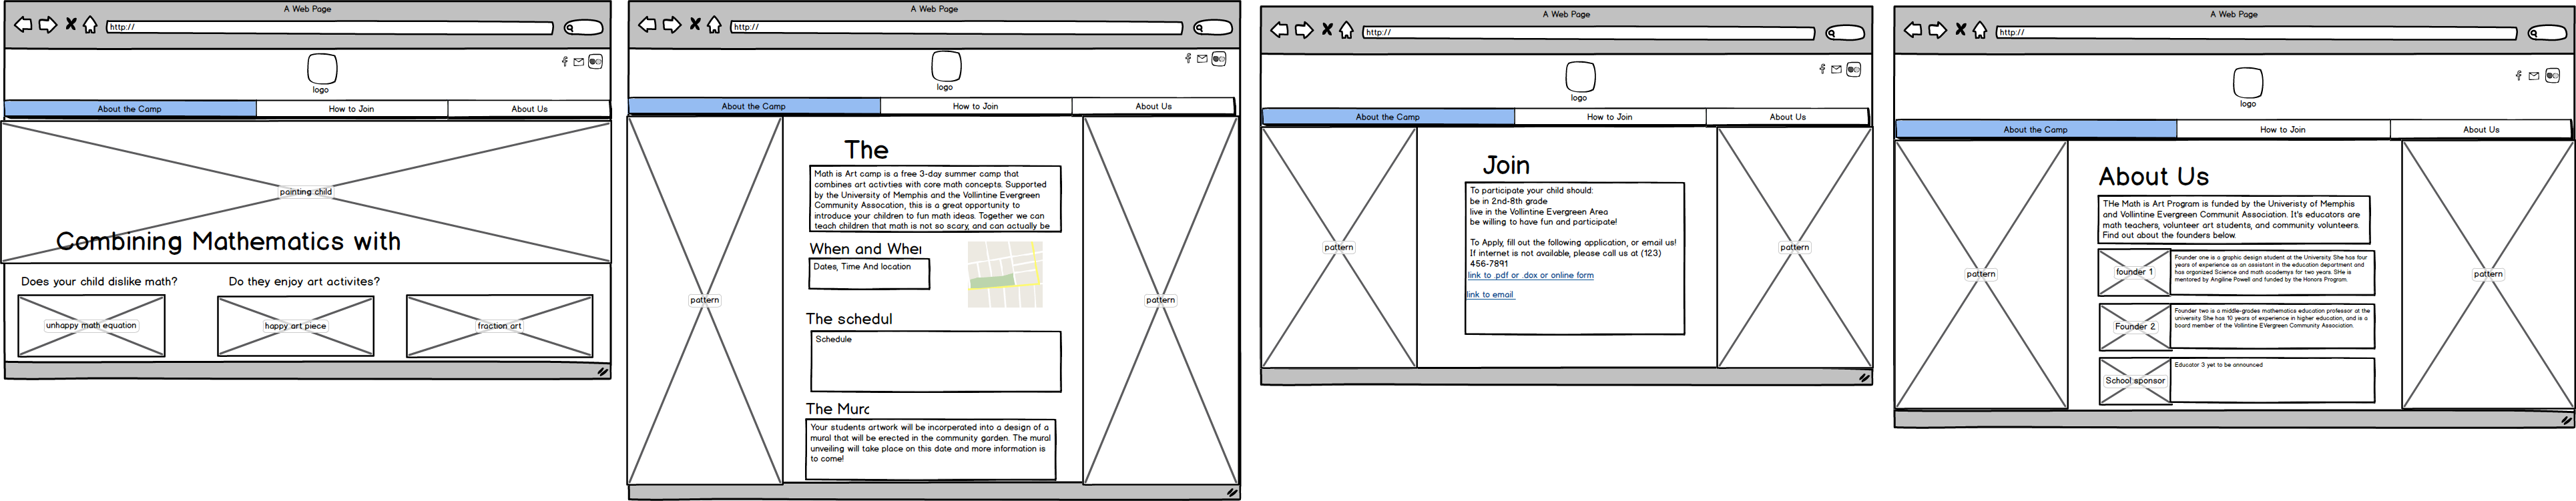 Math & Art Camp website - image 5 - student project